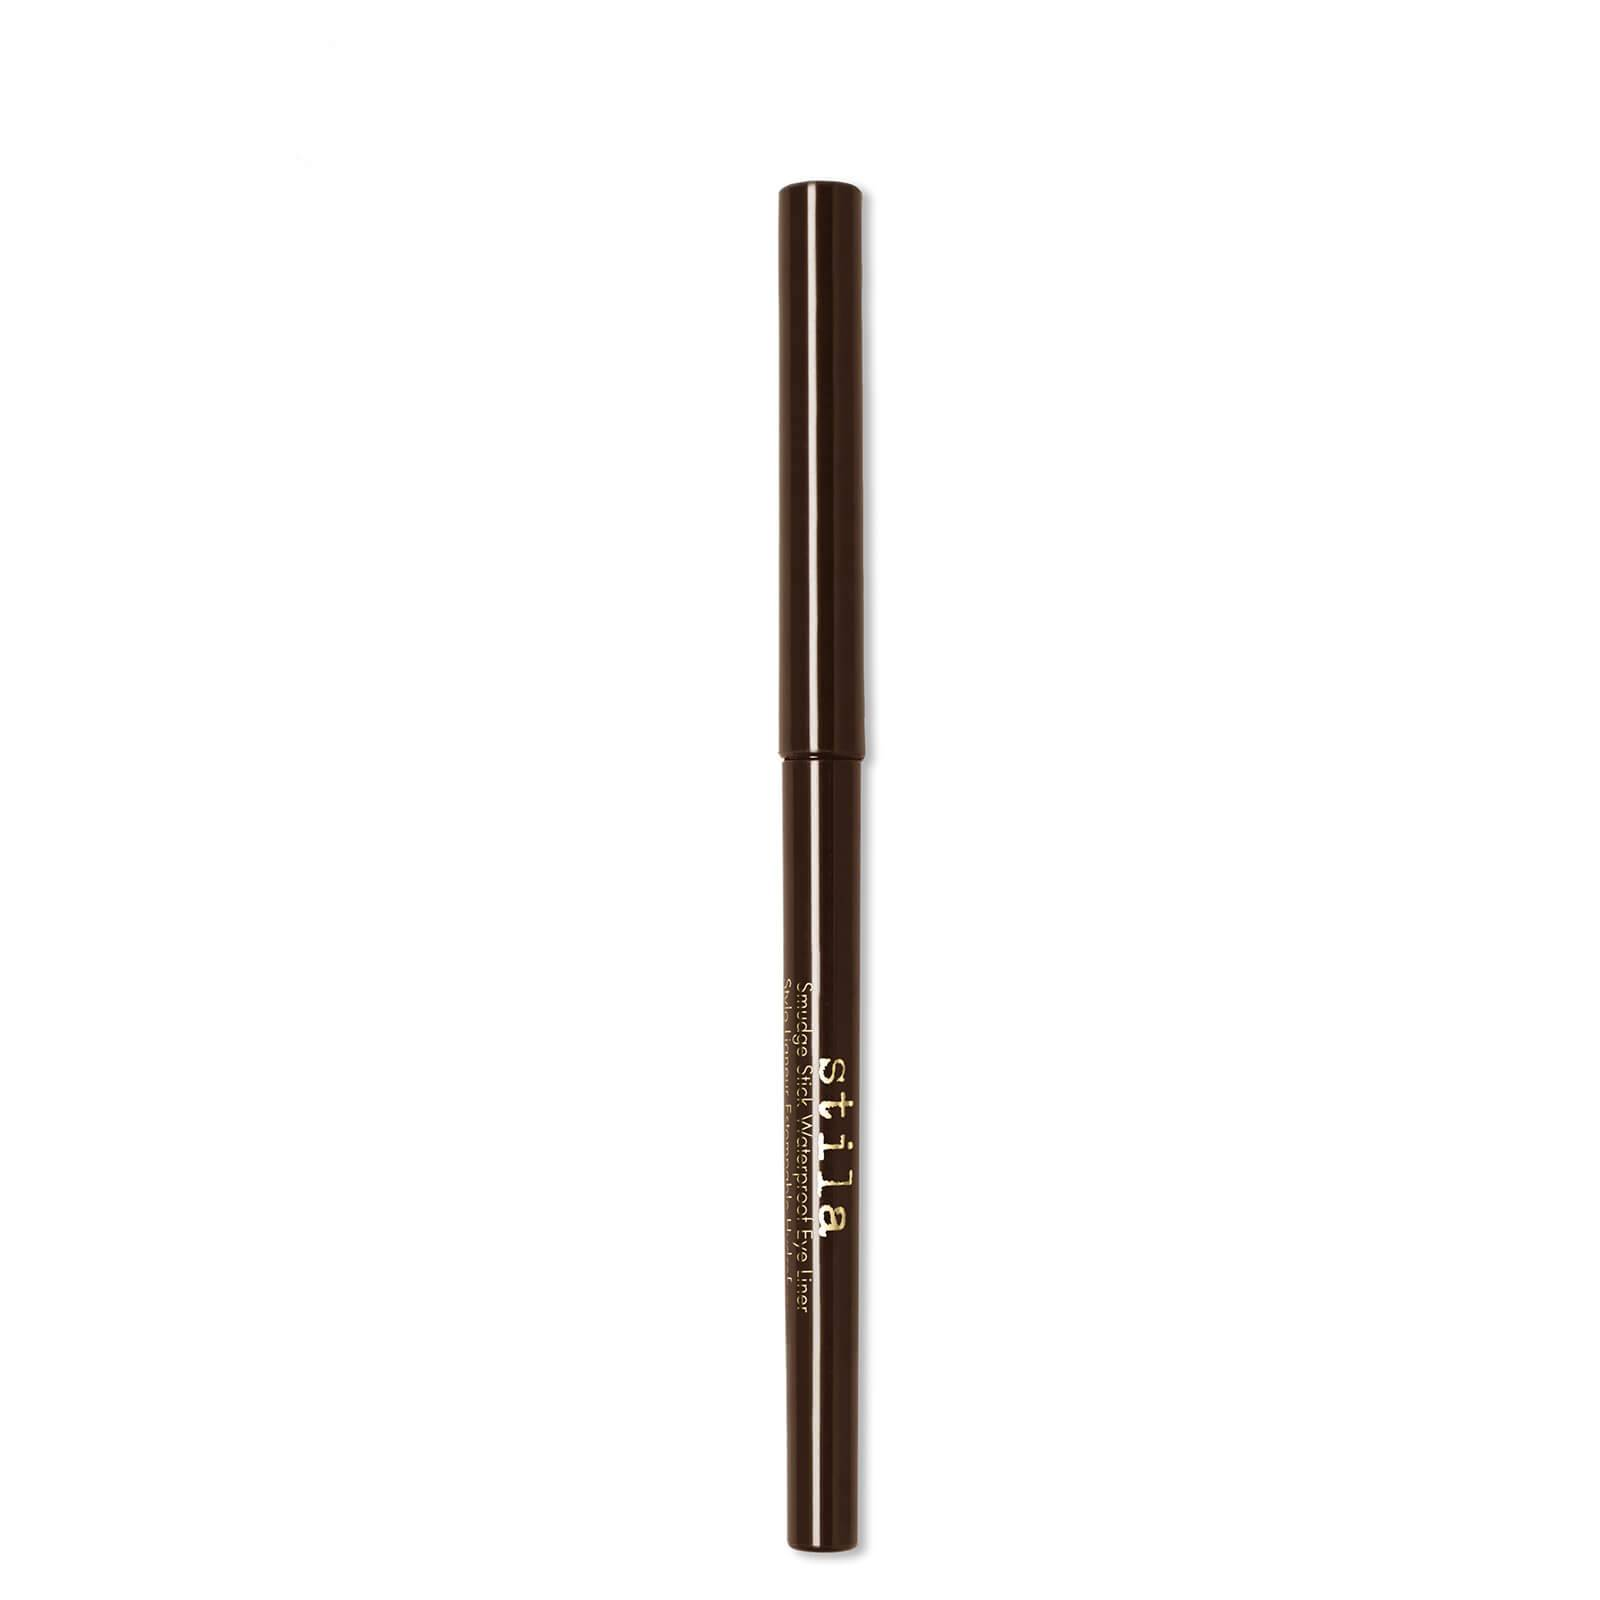 Stila Smudge Stick Waterproof Eye Liner (Various Shades) - Vivid Smoky Quartz